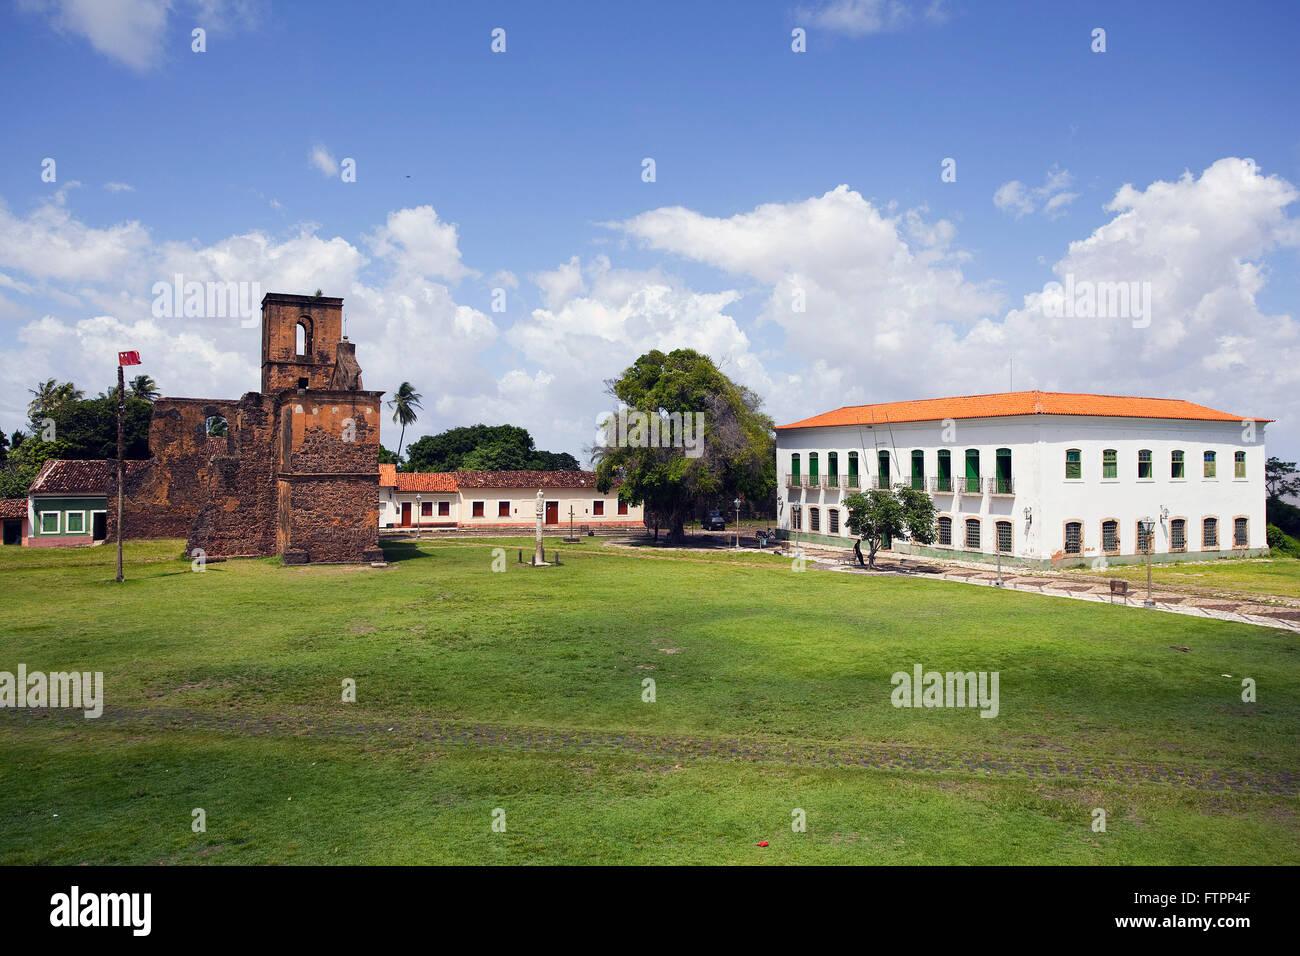 Ruins of the Church of Sao Matias - construction of the nineteenth century masonry - Stock Image